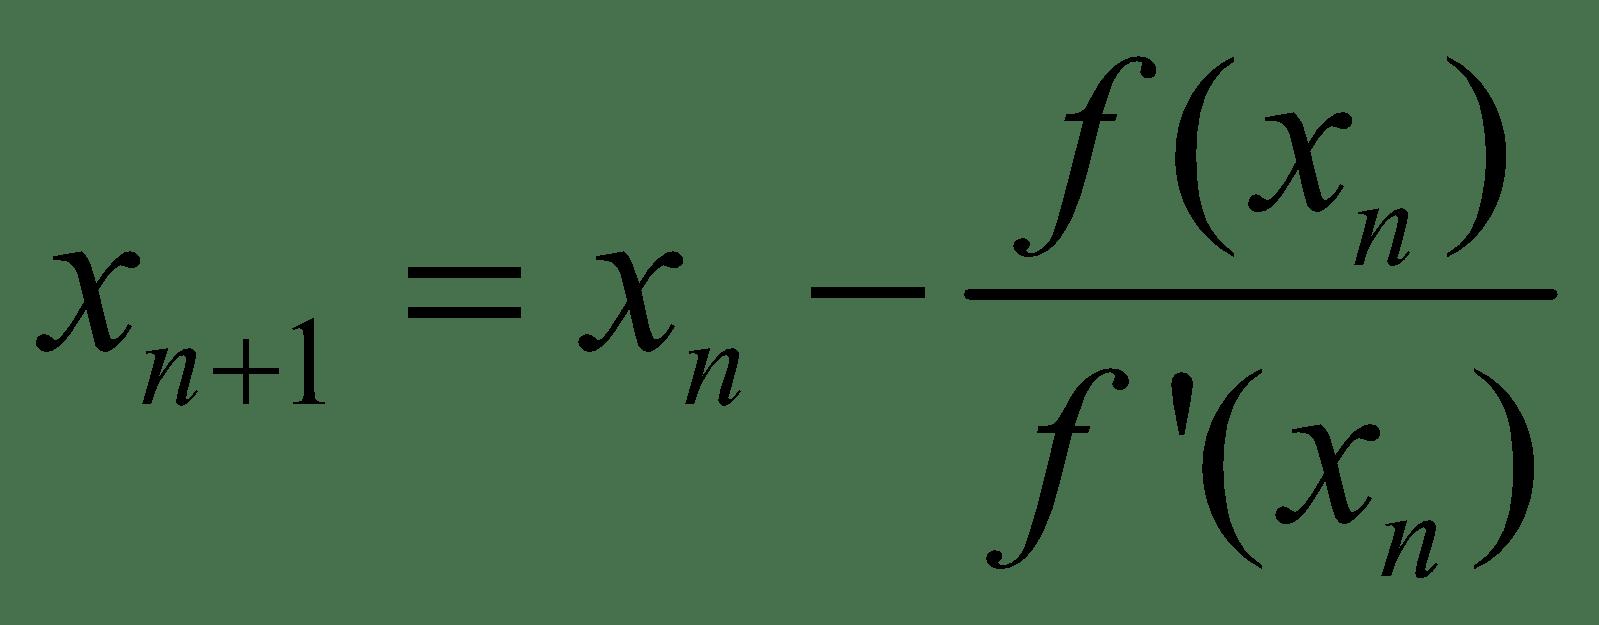 Resultado de imagen para newton raphson formula